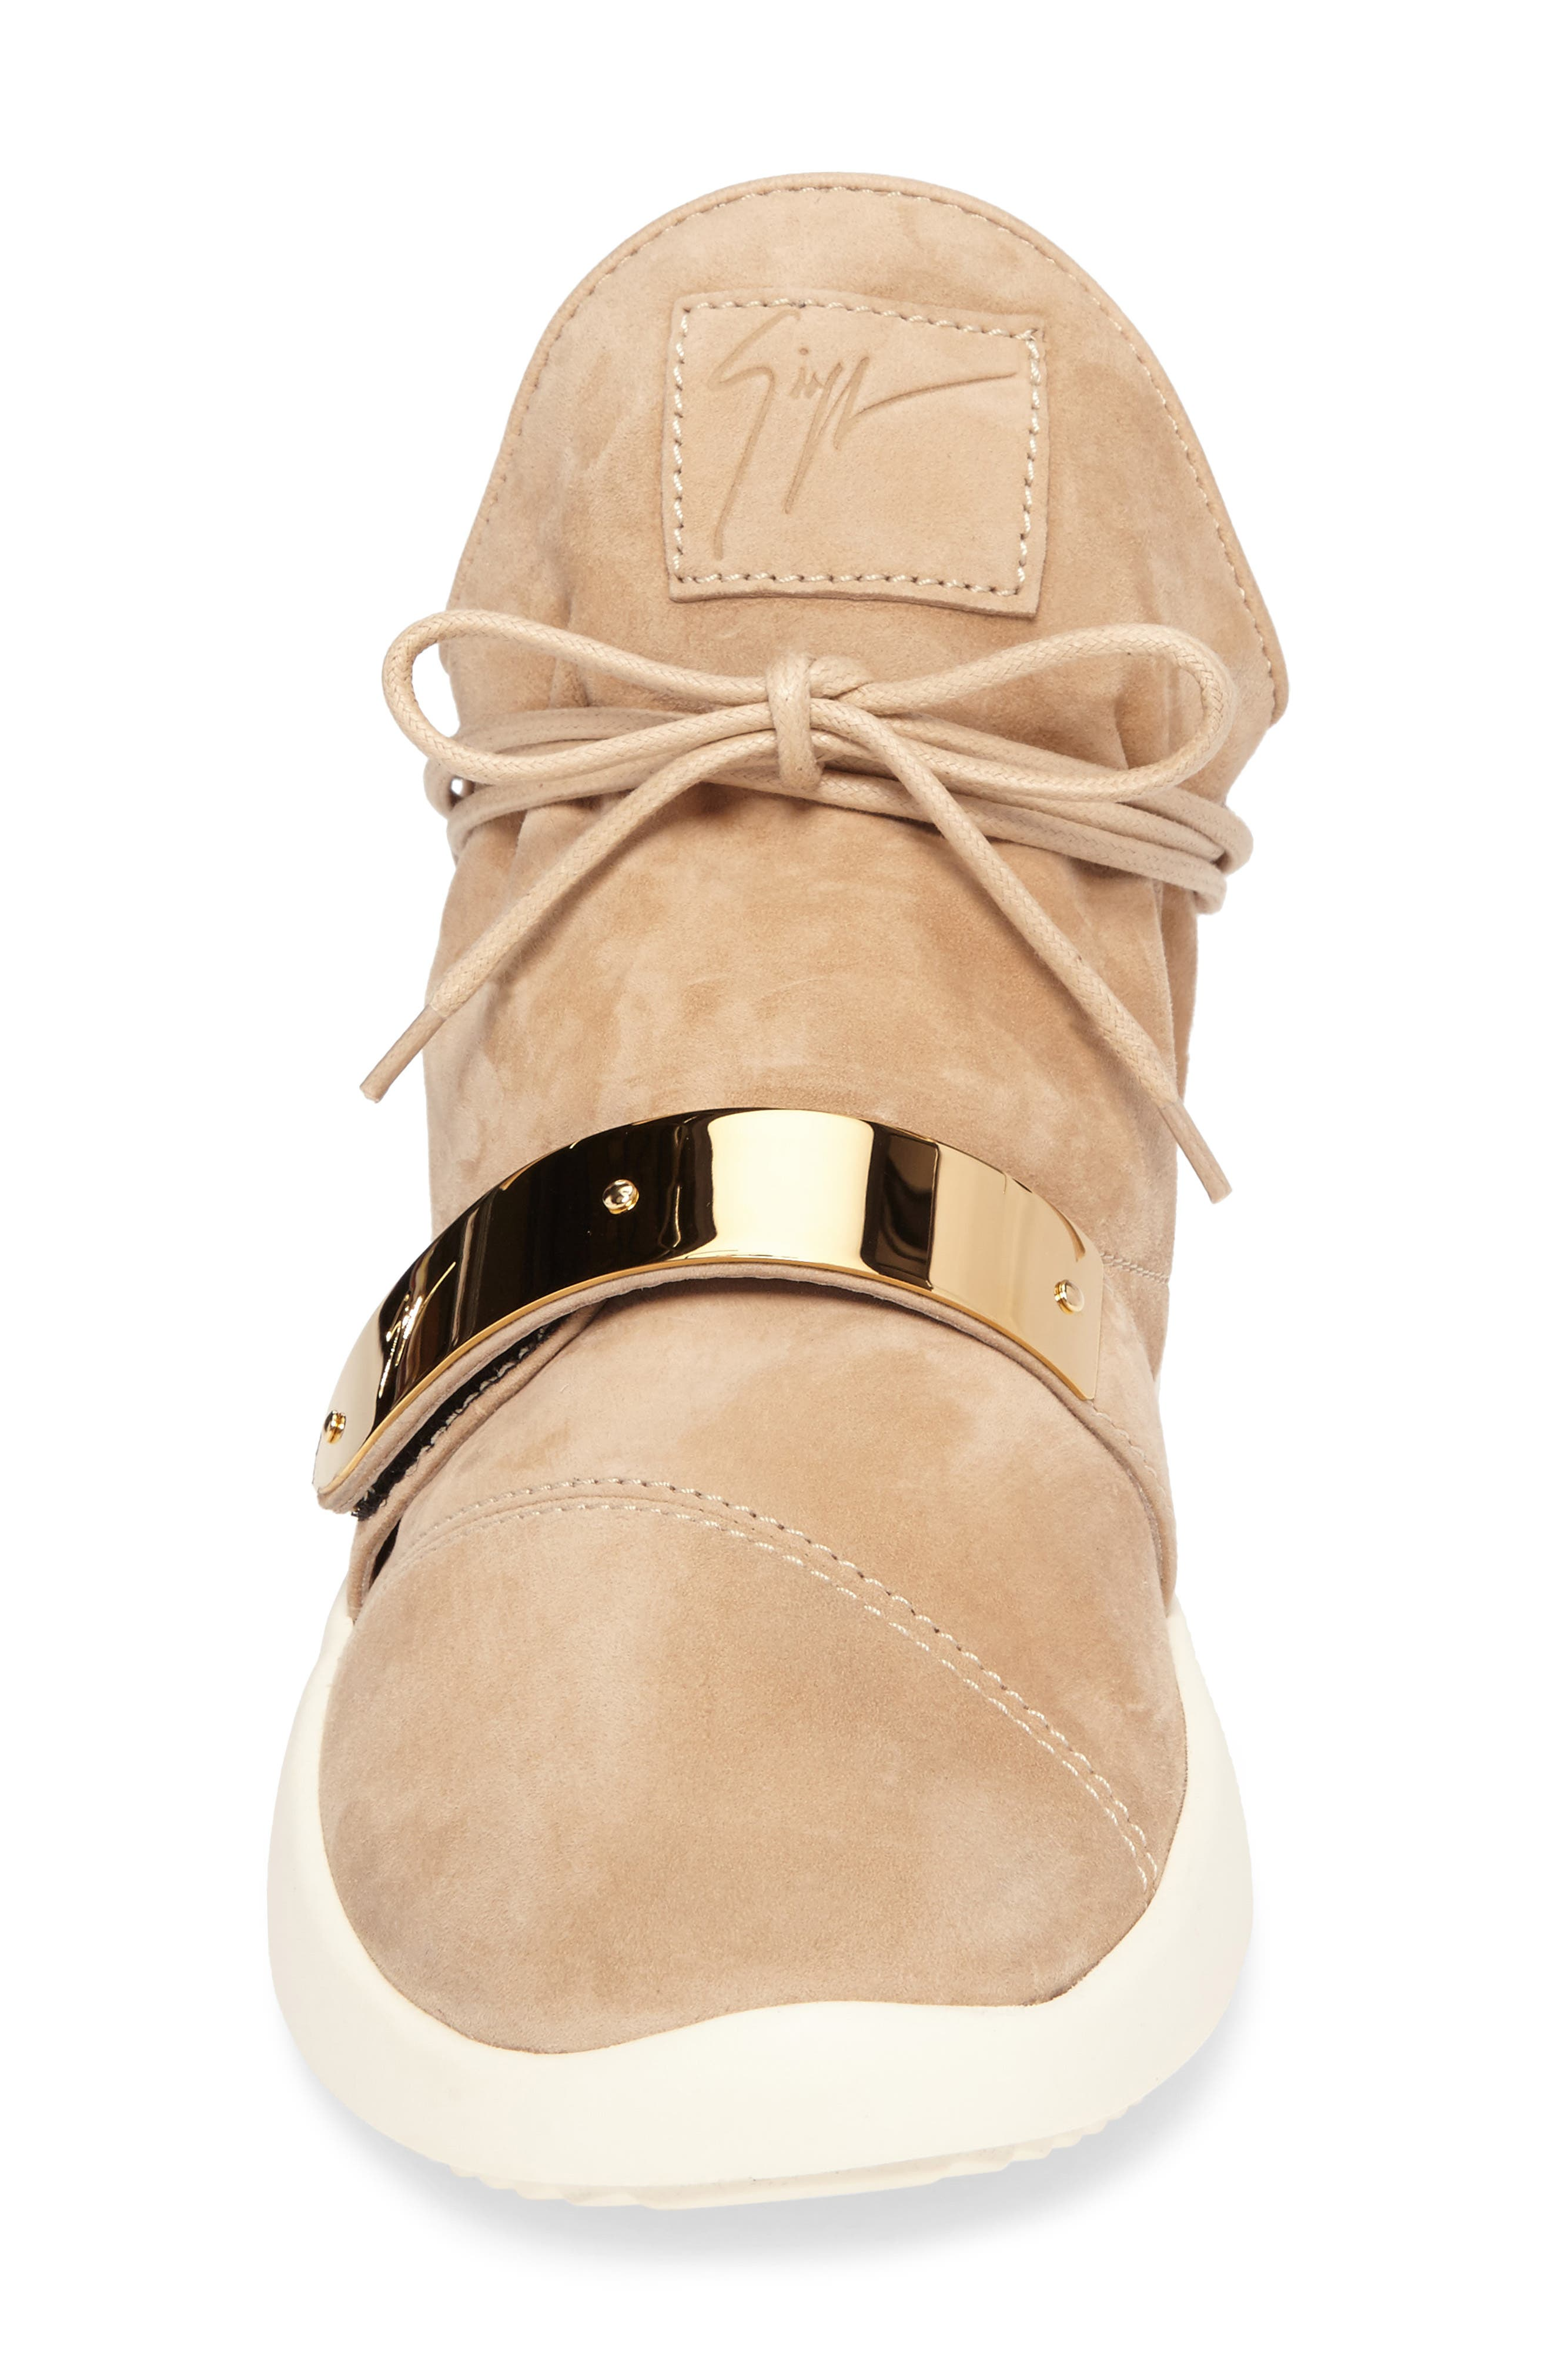 Gold Bar Mid-Top Sneaker,                             Alternate thumbnail 4, color,                             238